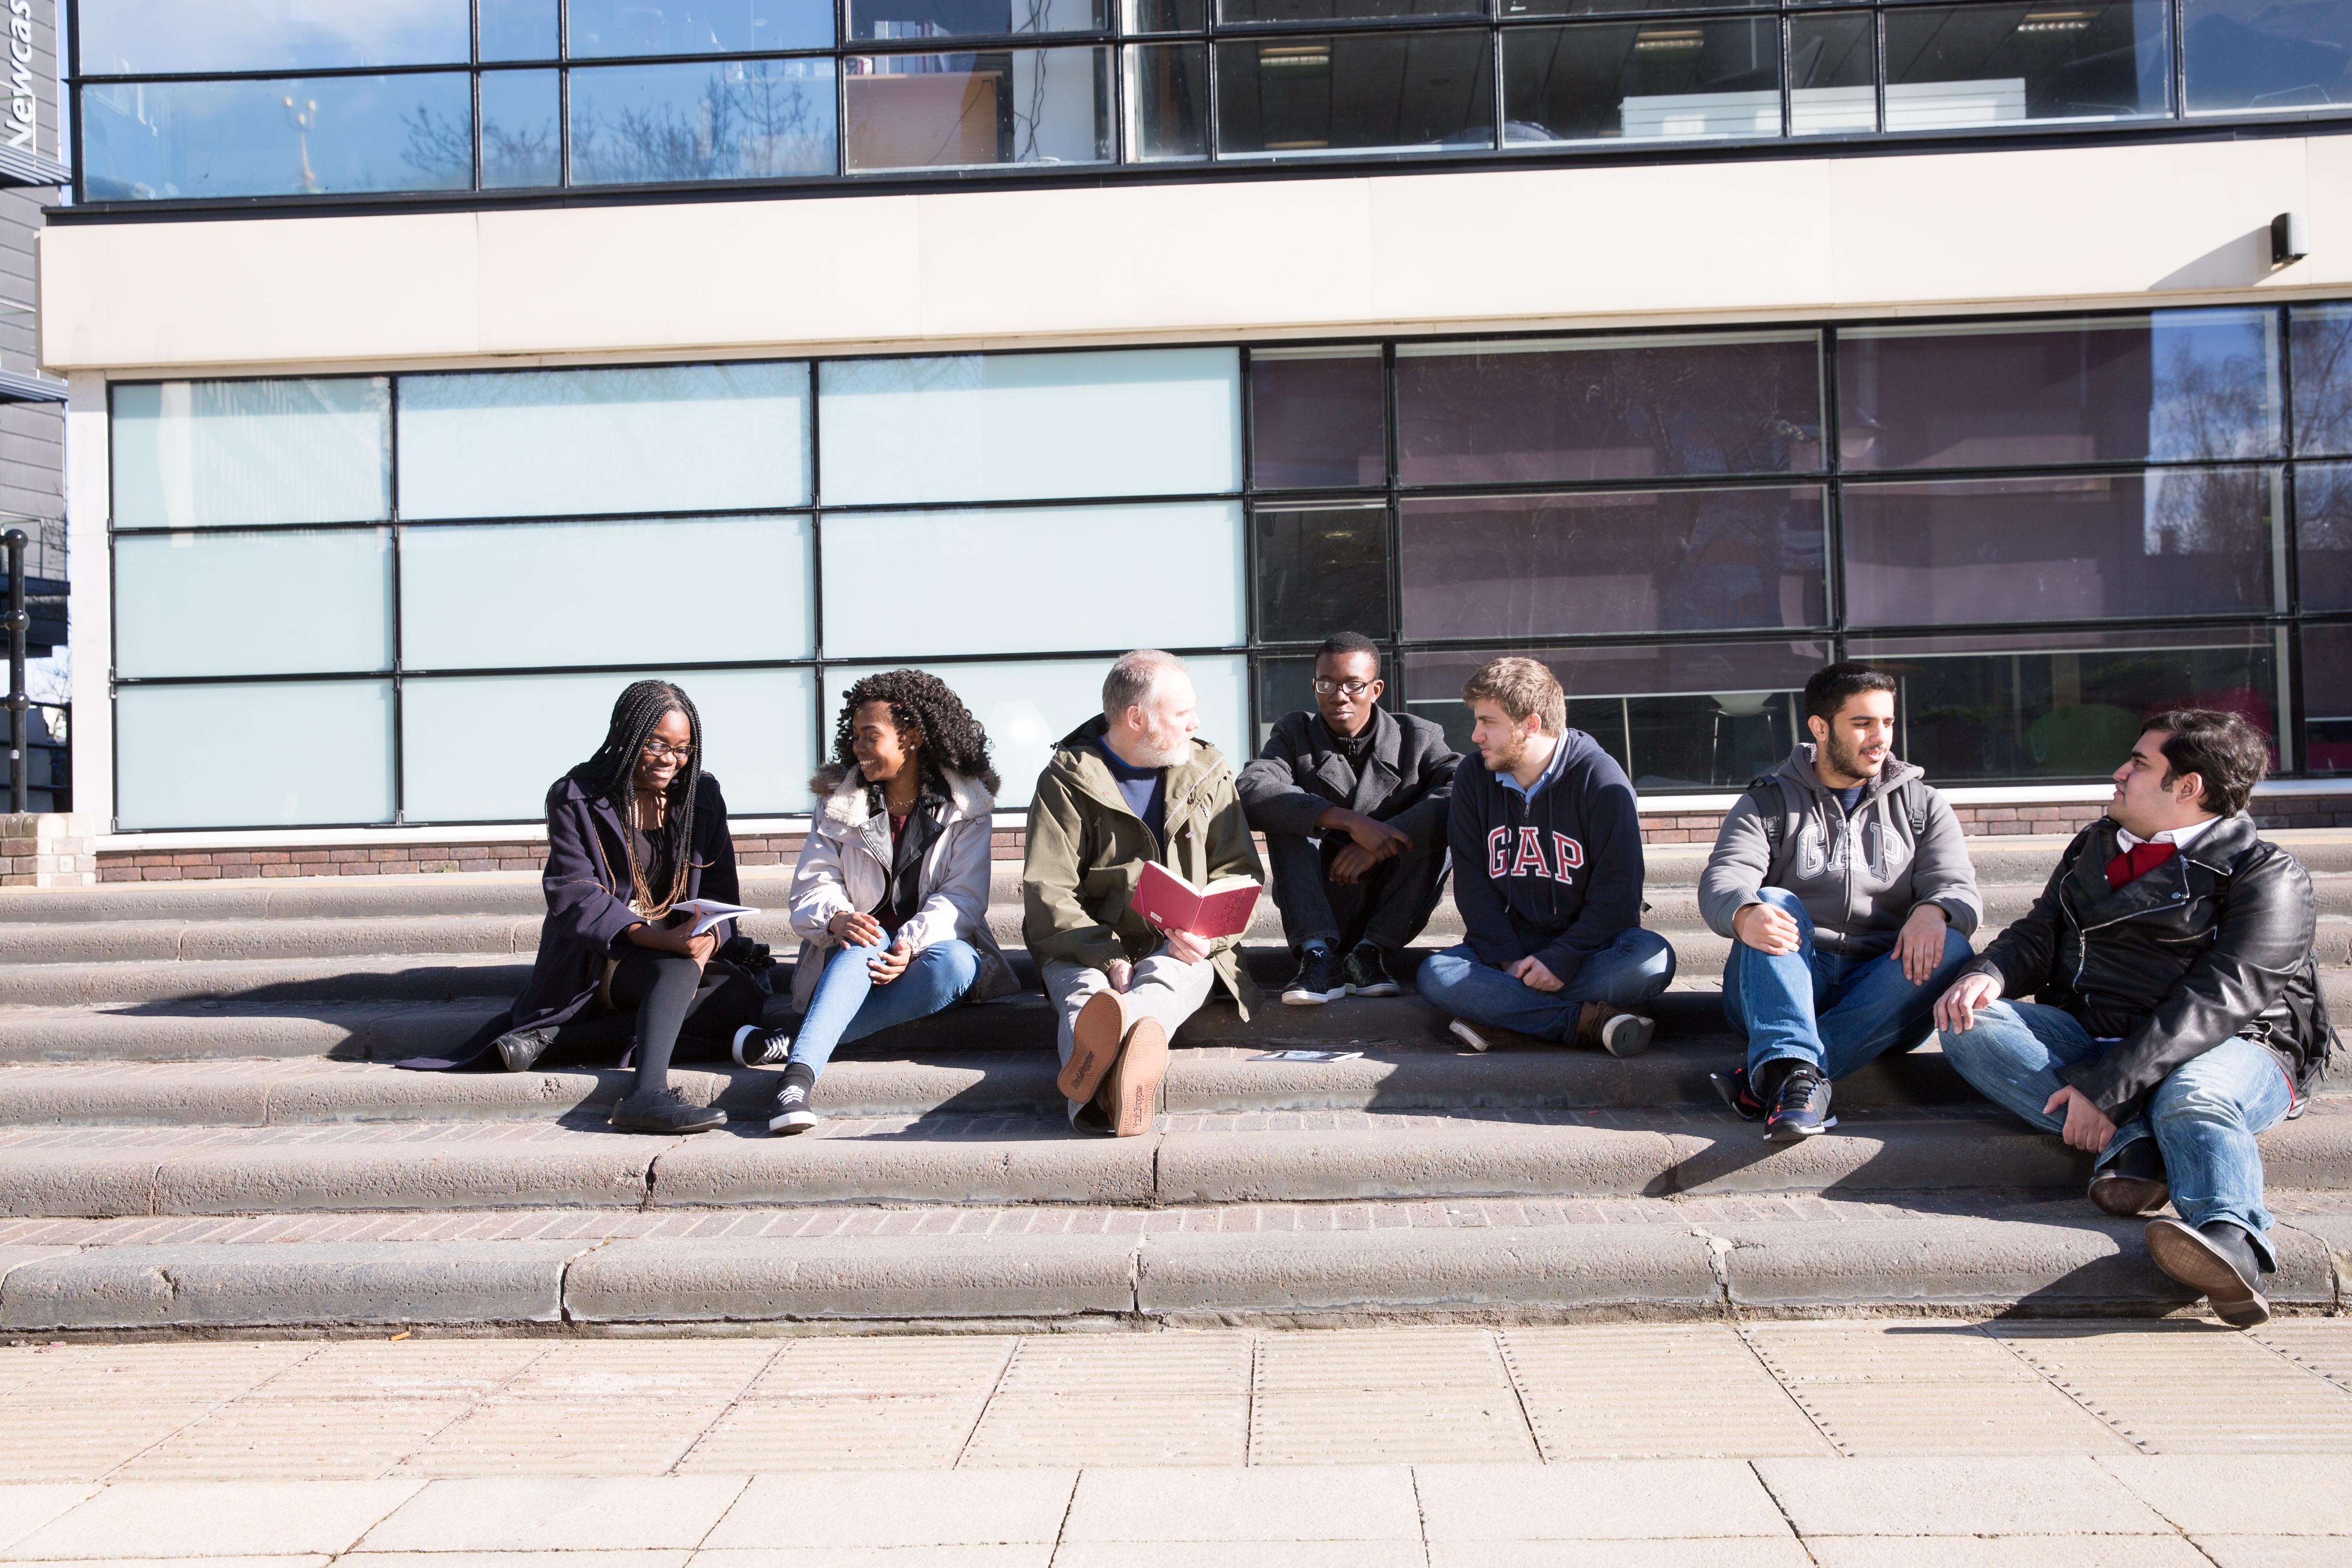 Students at Northumbria University Pathway